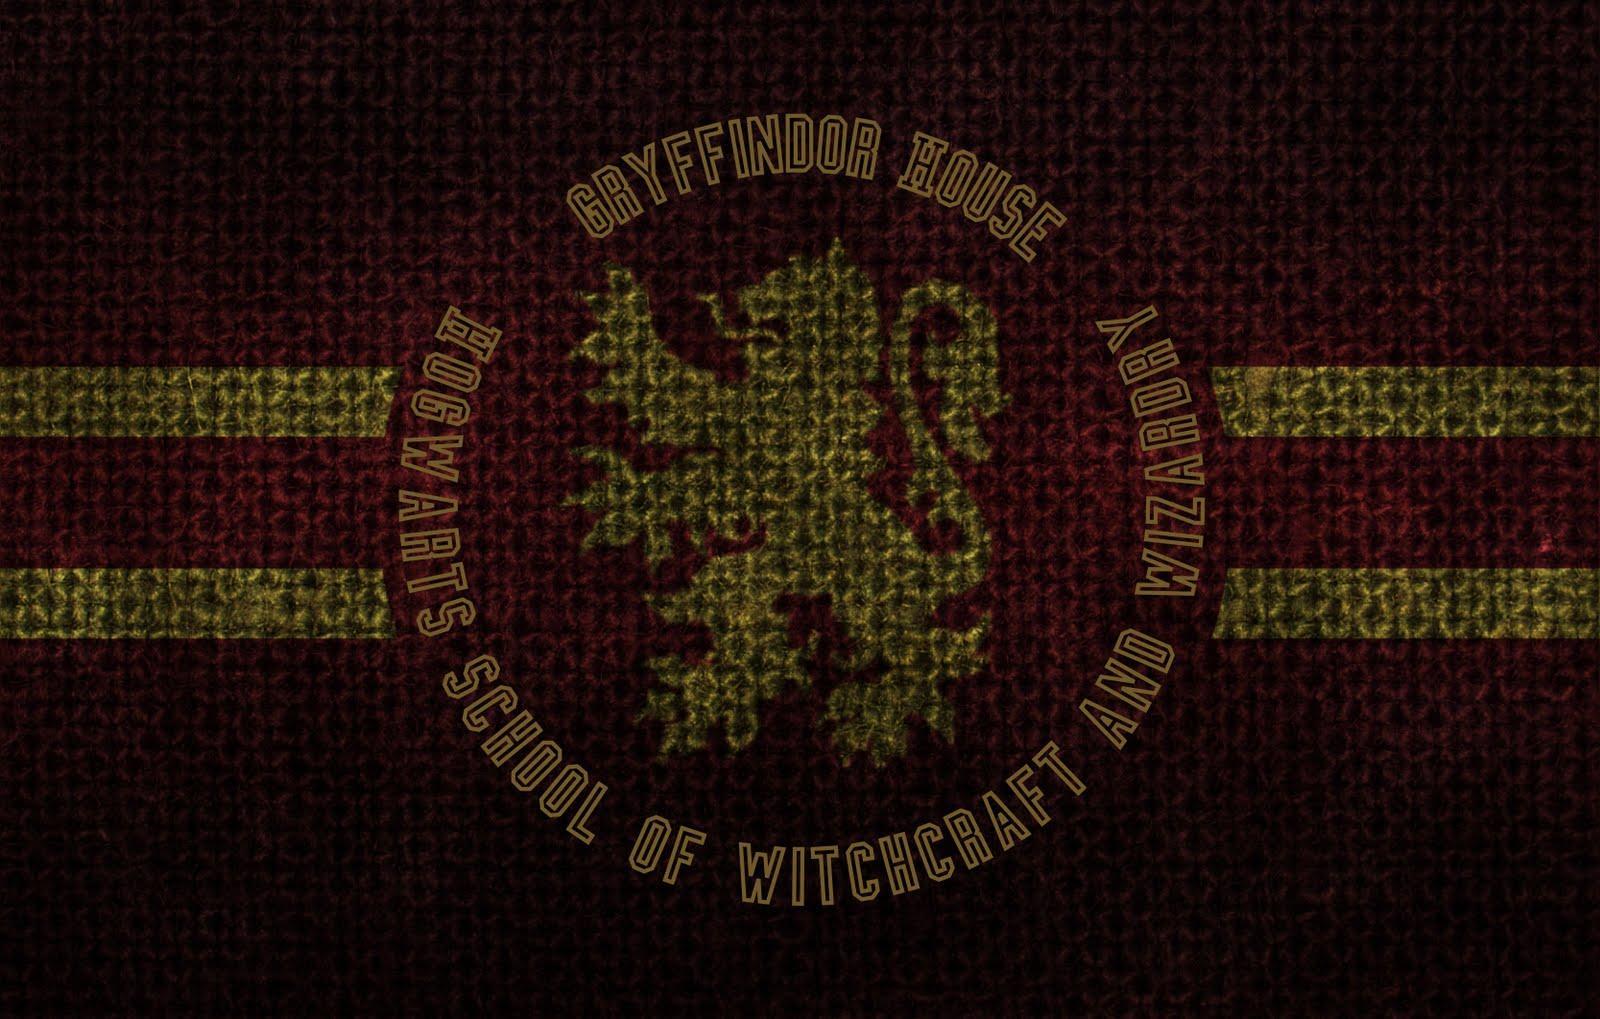 Harry Potter Gryffindor Wallpapers Wallpaper Cave